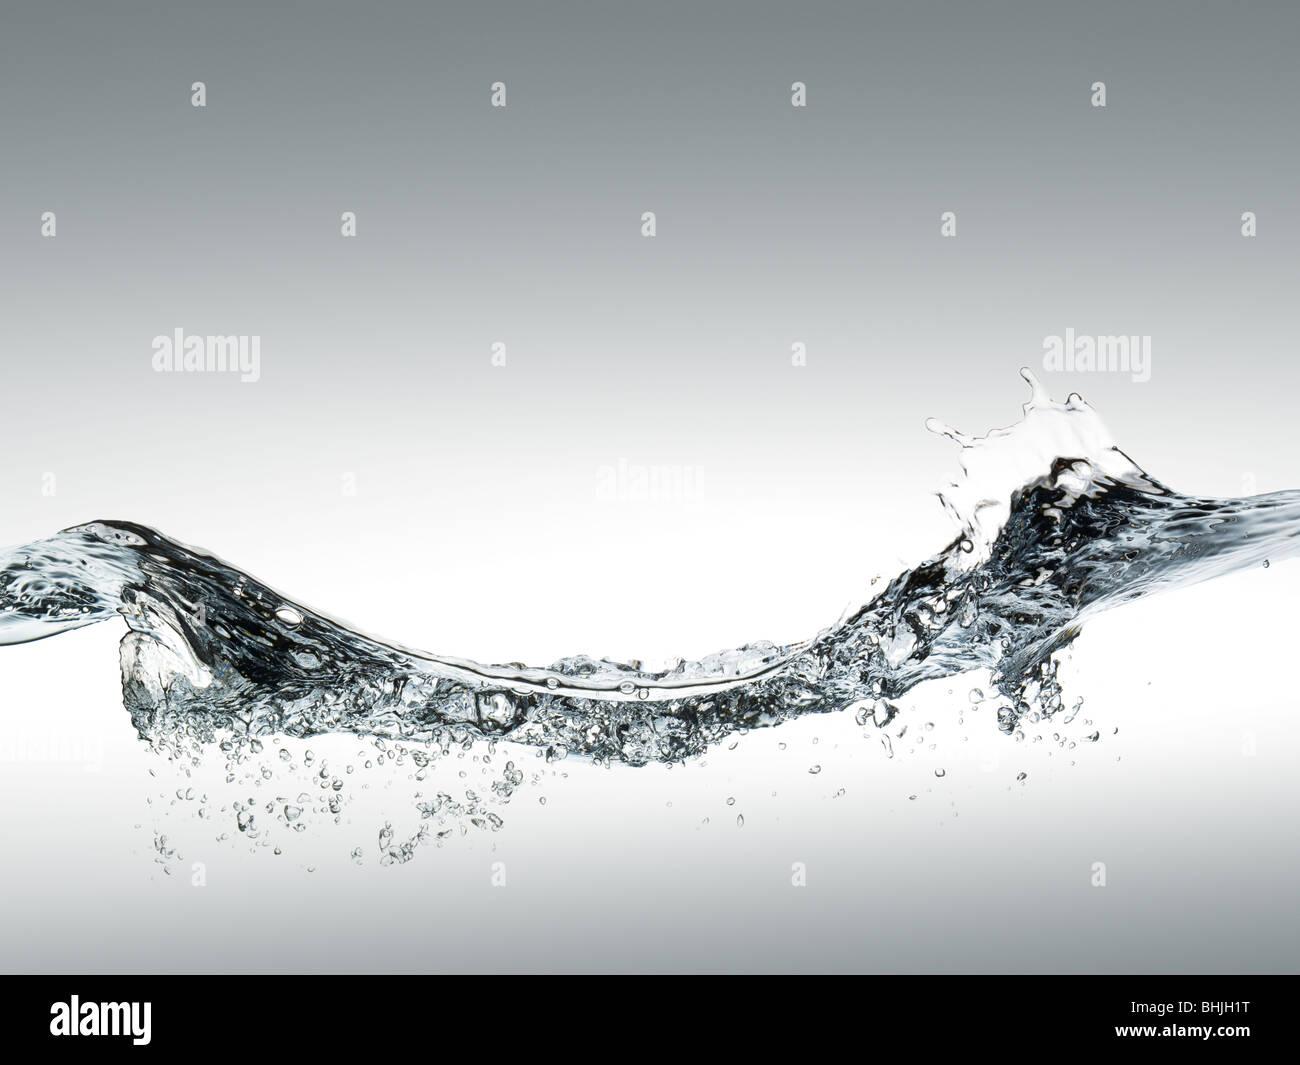 Ola, agua sruface Imagen De Stock